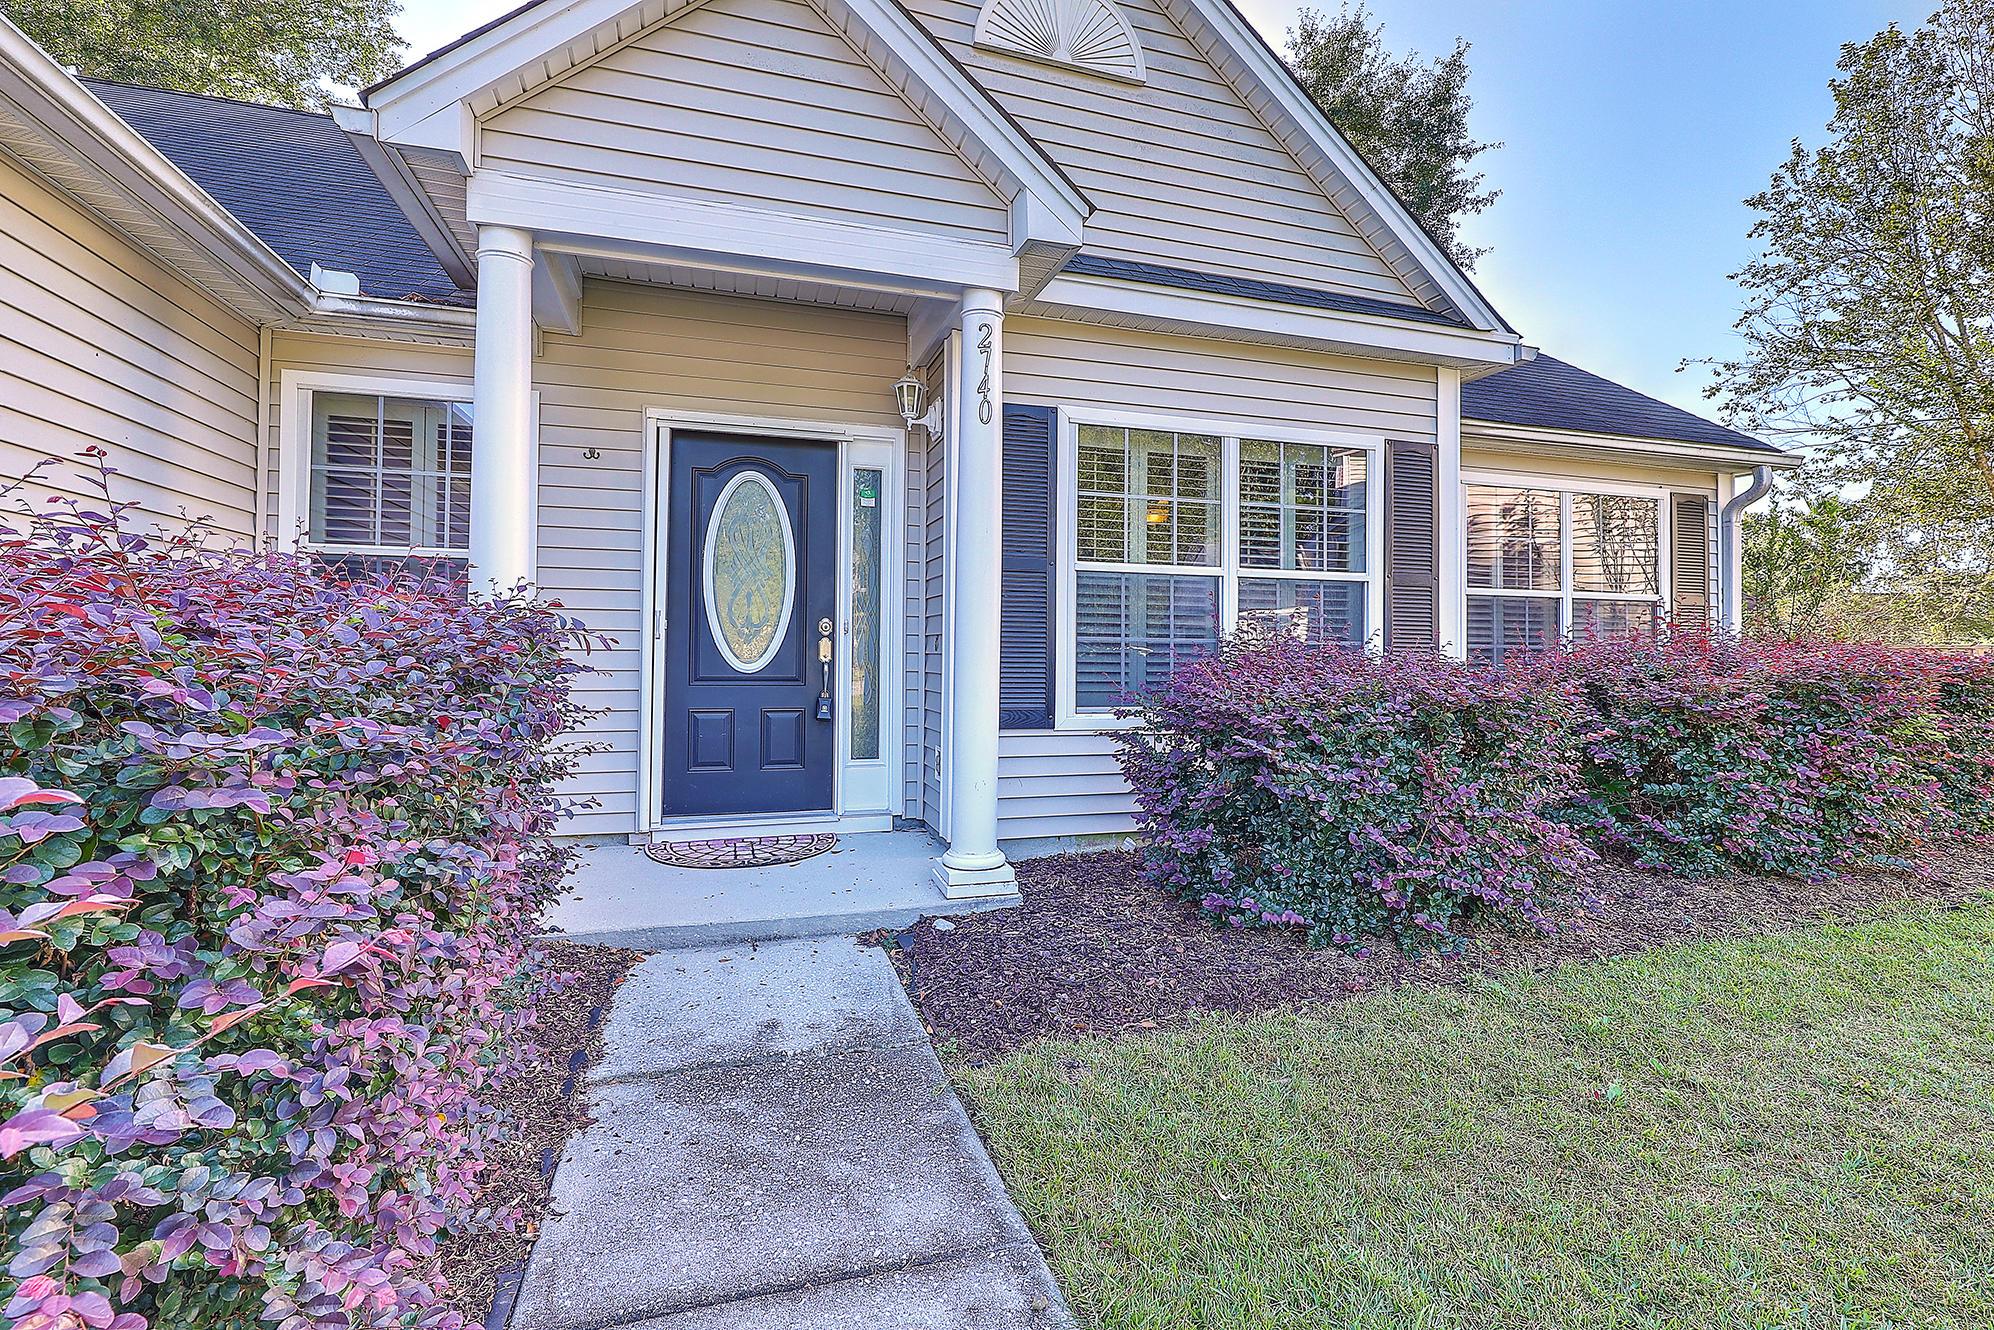 Planters Pointe Homes For Sale - 2740 Four Winds, Mount Pleasant, SC - 12